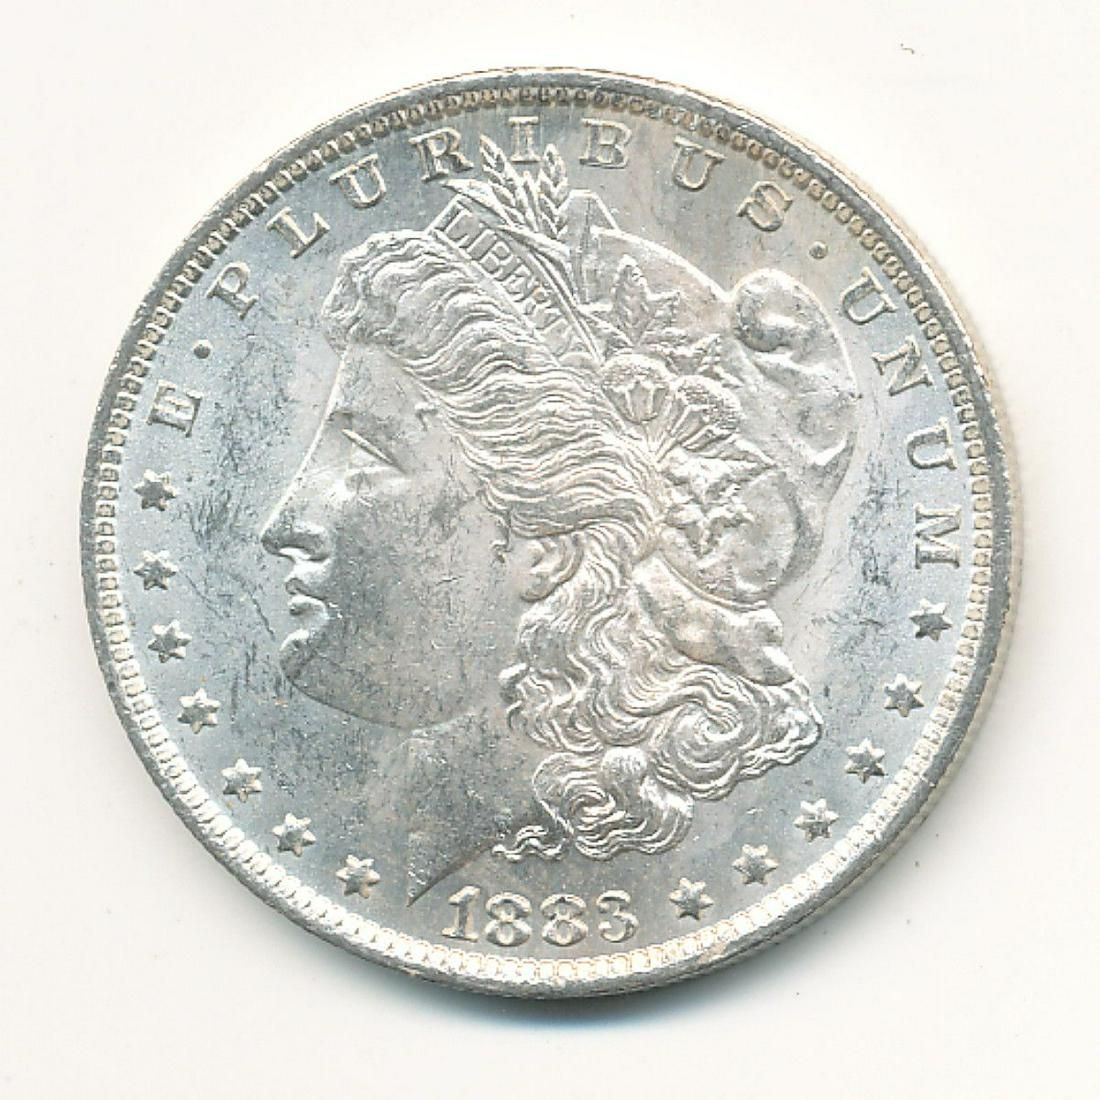 1883-O MORGAN SILVER DOLLAR MS63